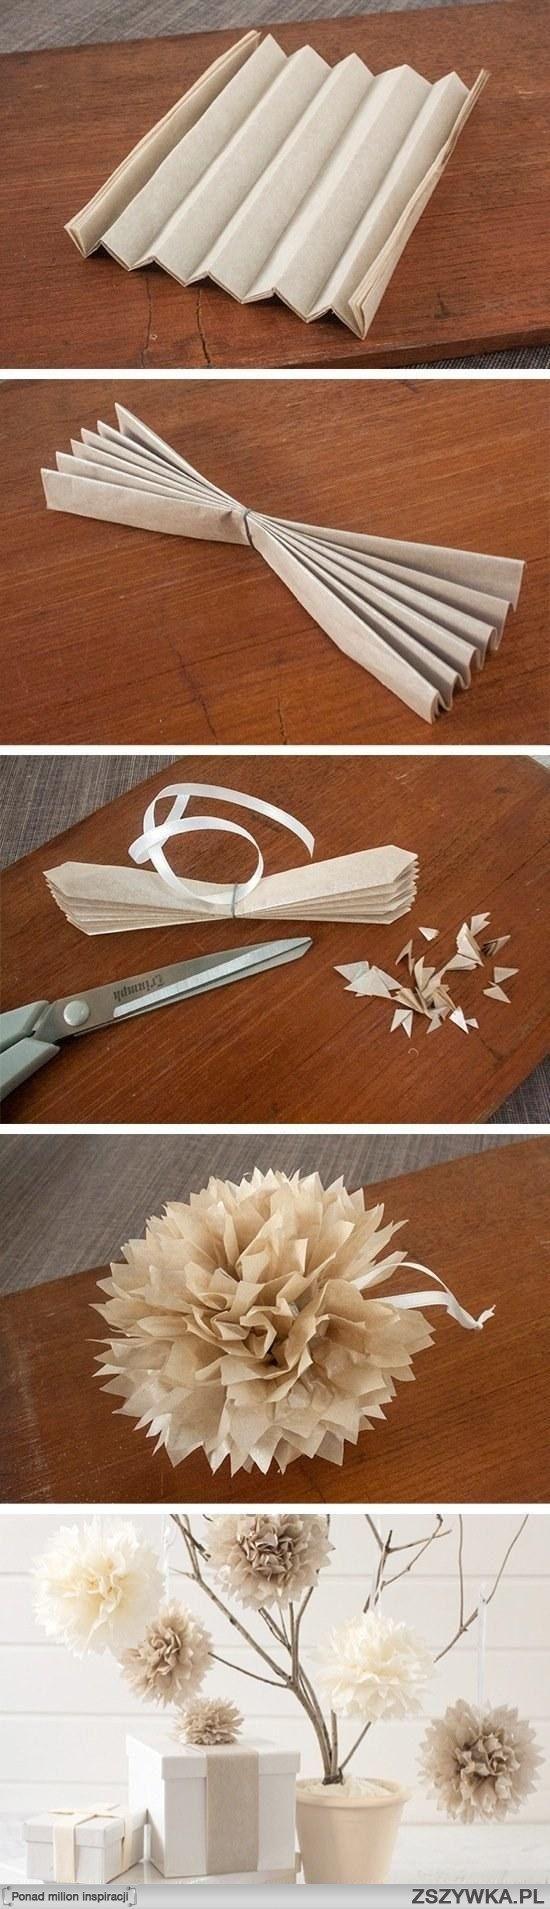 Kwiaty Na Pomysly Zszywka Pl Tissue Paper Pom Poms Diy Christmas Diy Paper Flowers